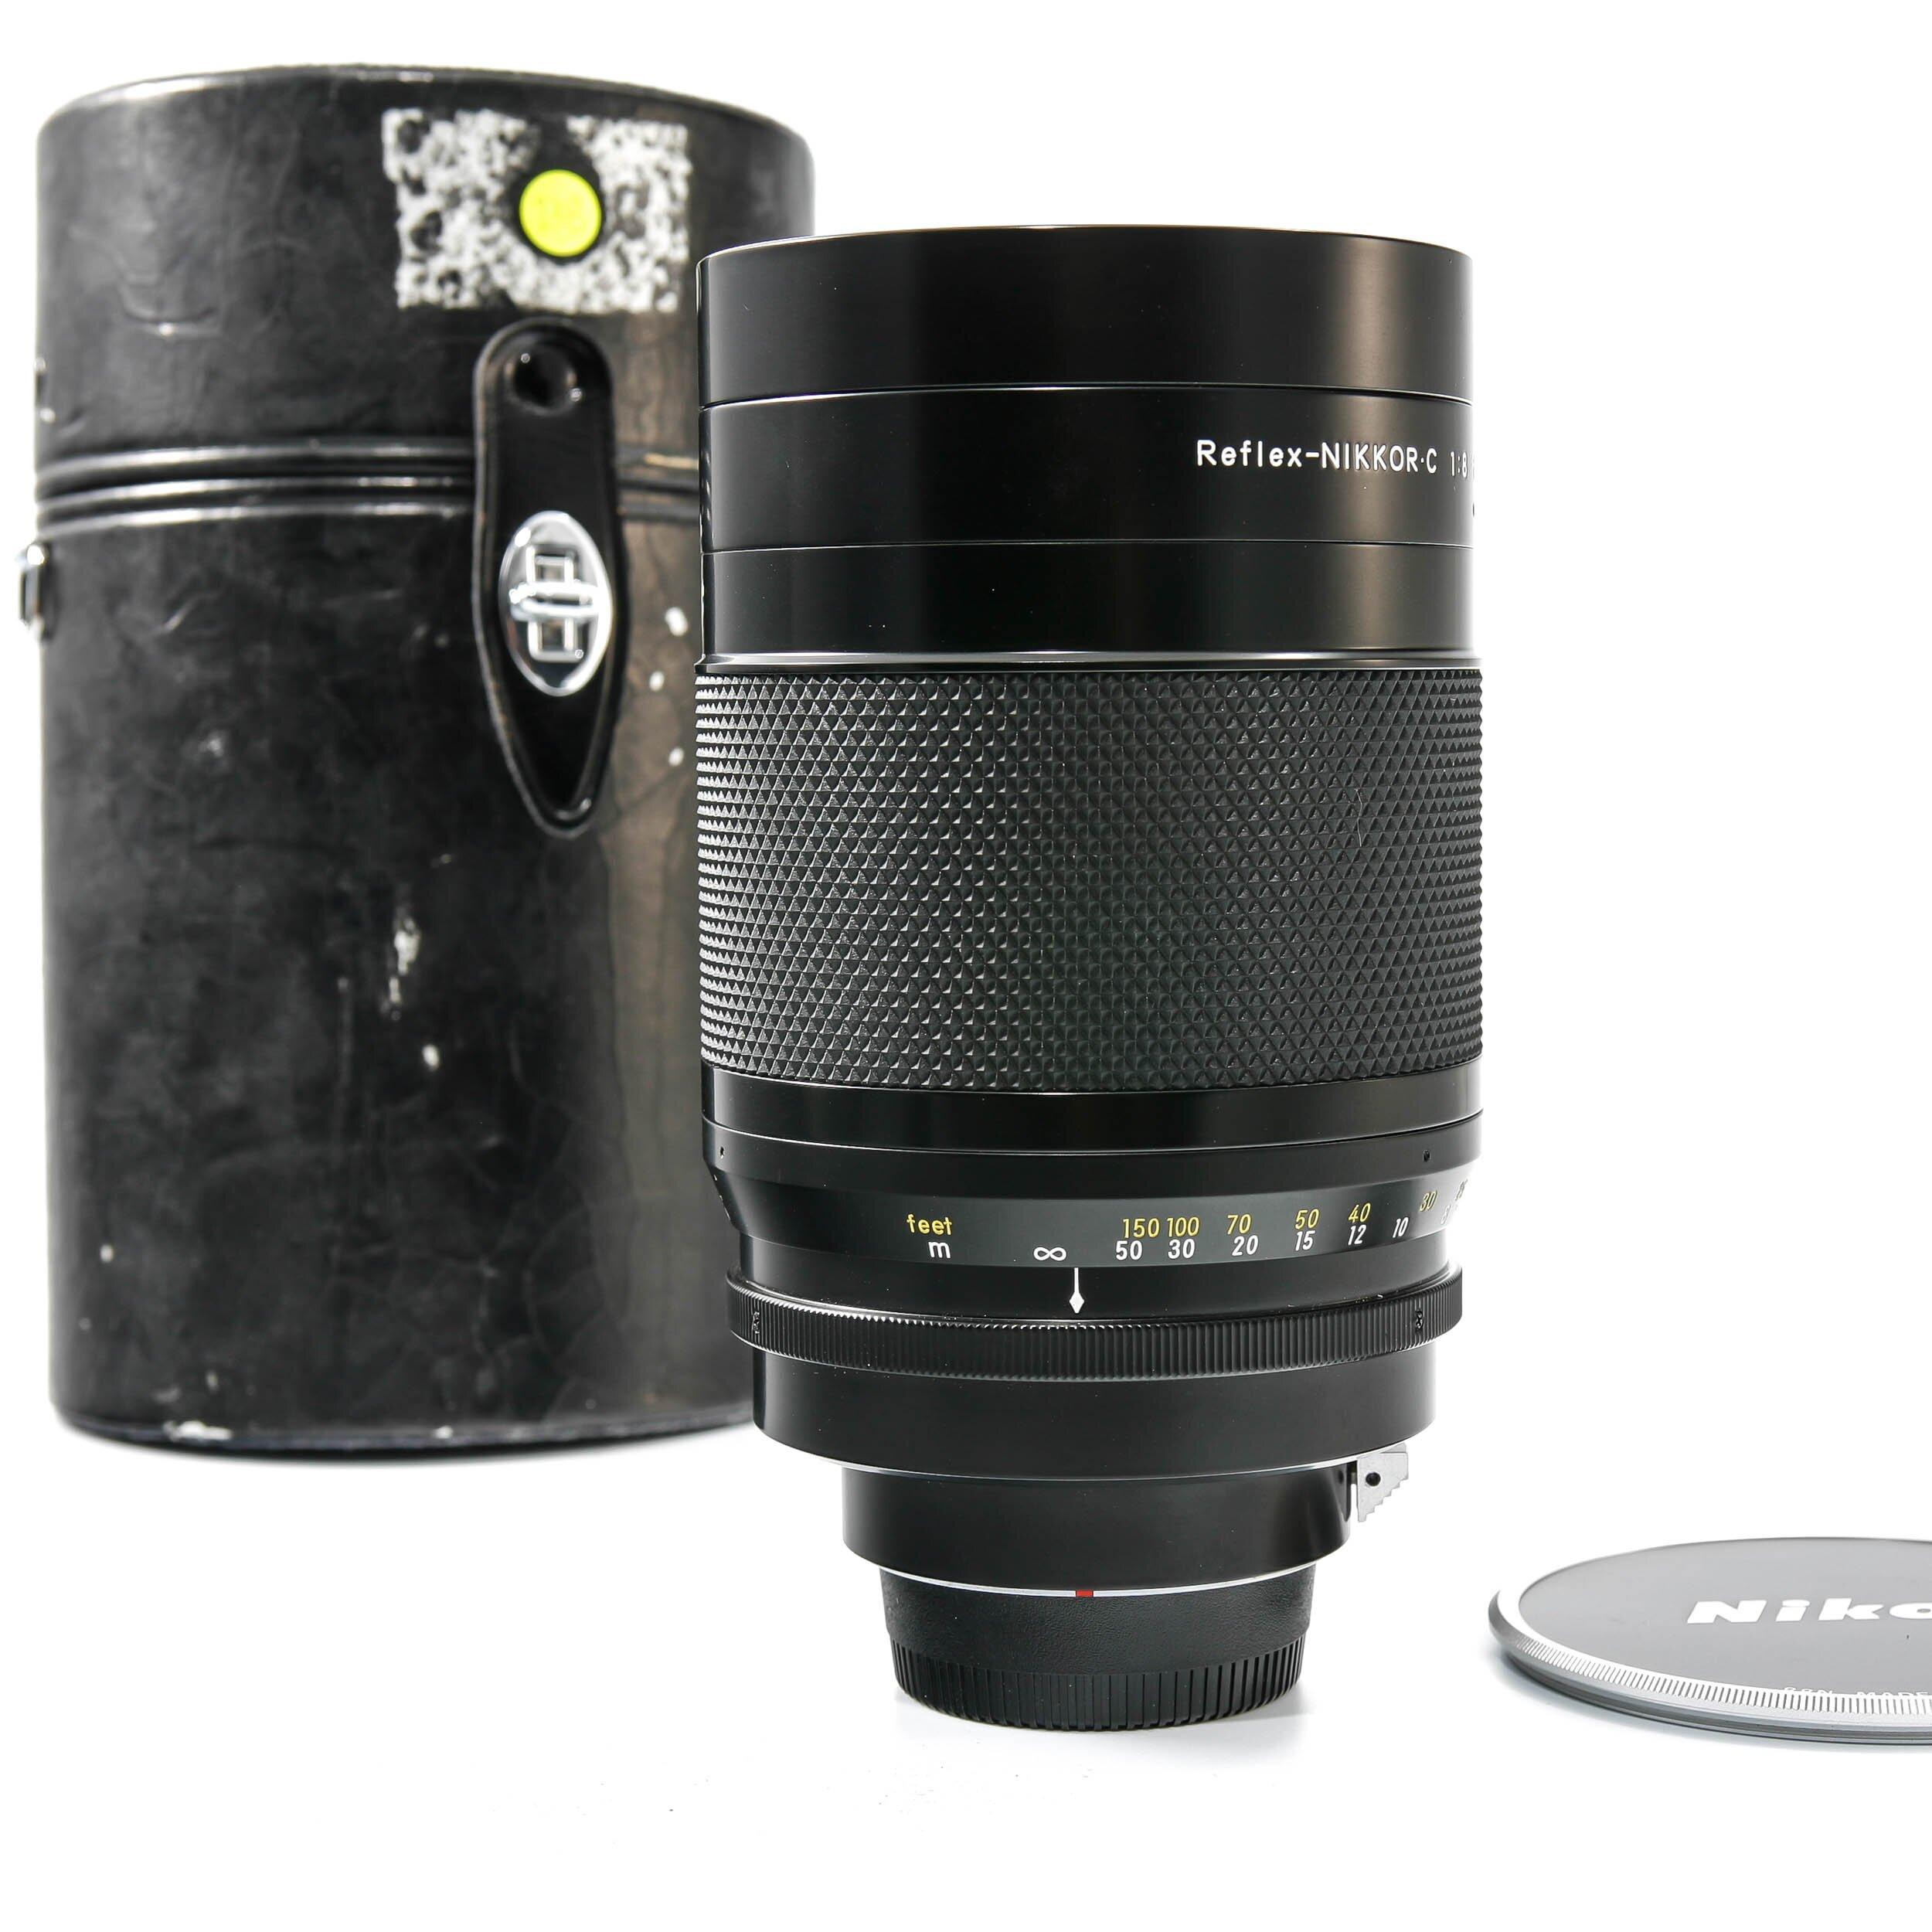 Nikon 500mm F8.0 Reflex Nikkor C